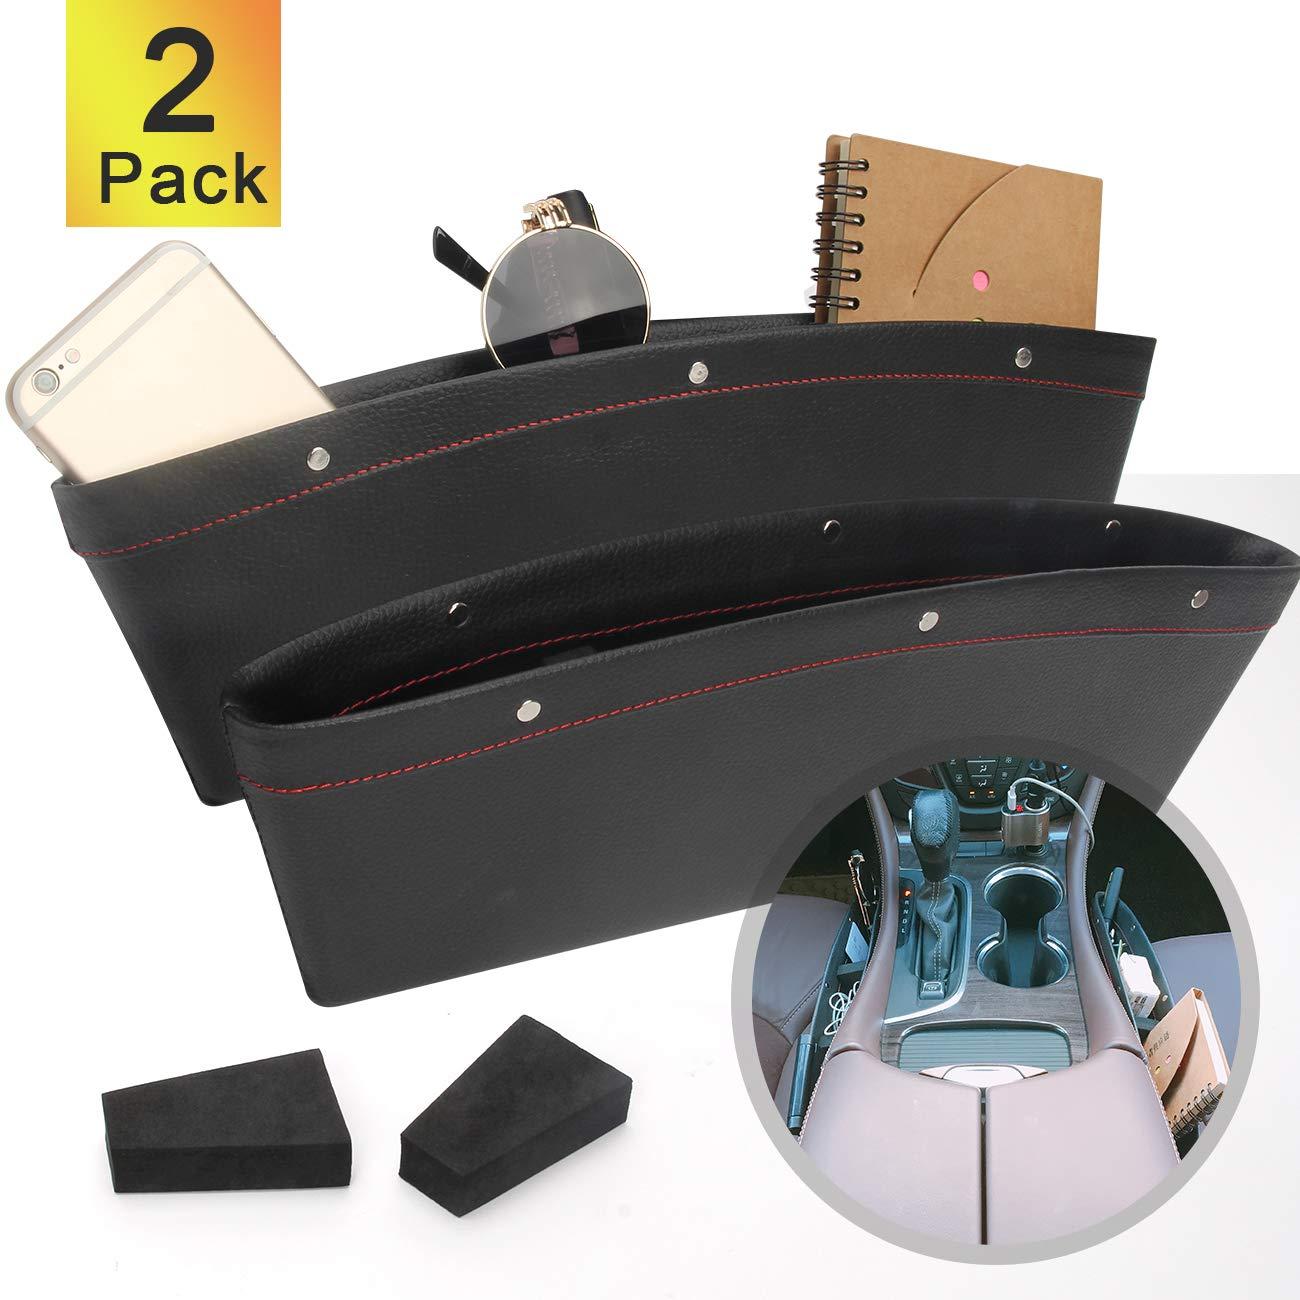 Coitak 2 PCS Car Seat Gap Organizer, PU Full Leather Car Seat Console Organizer, Black Car Seat Gap Filler by Coitak